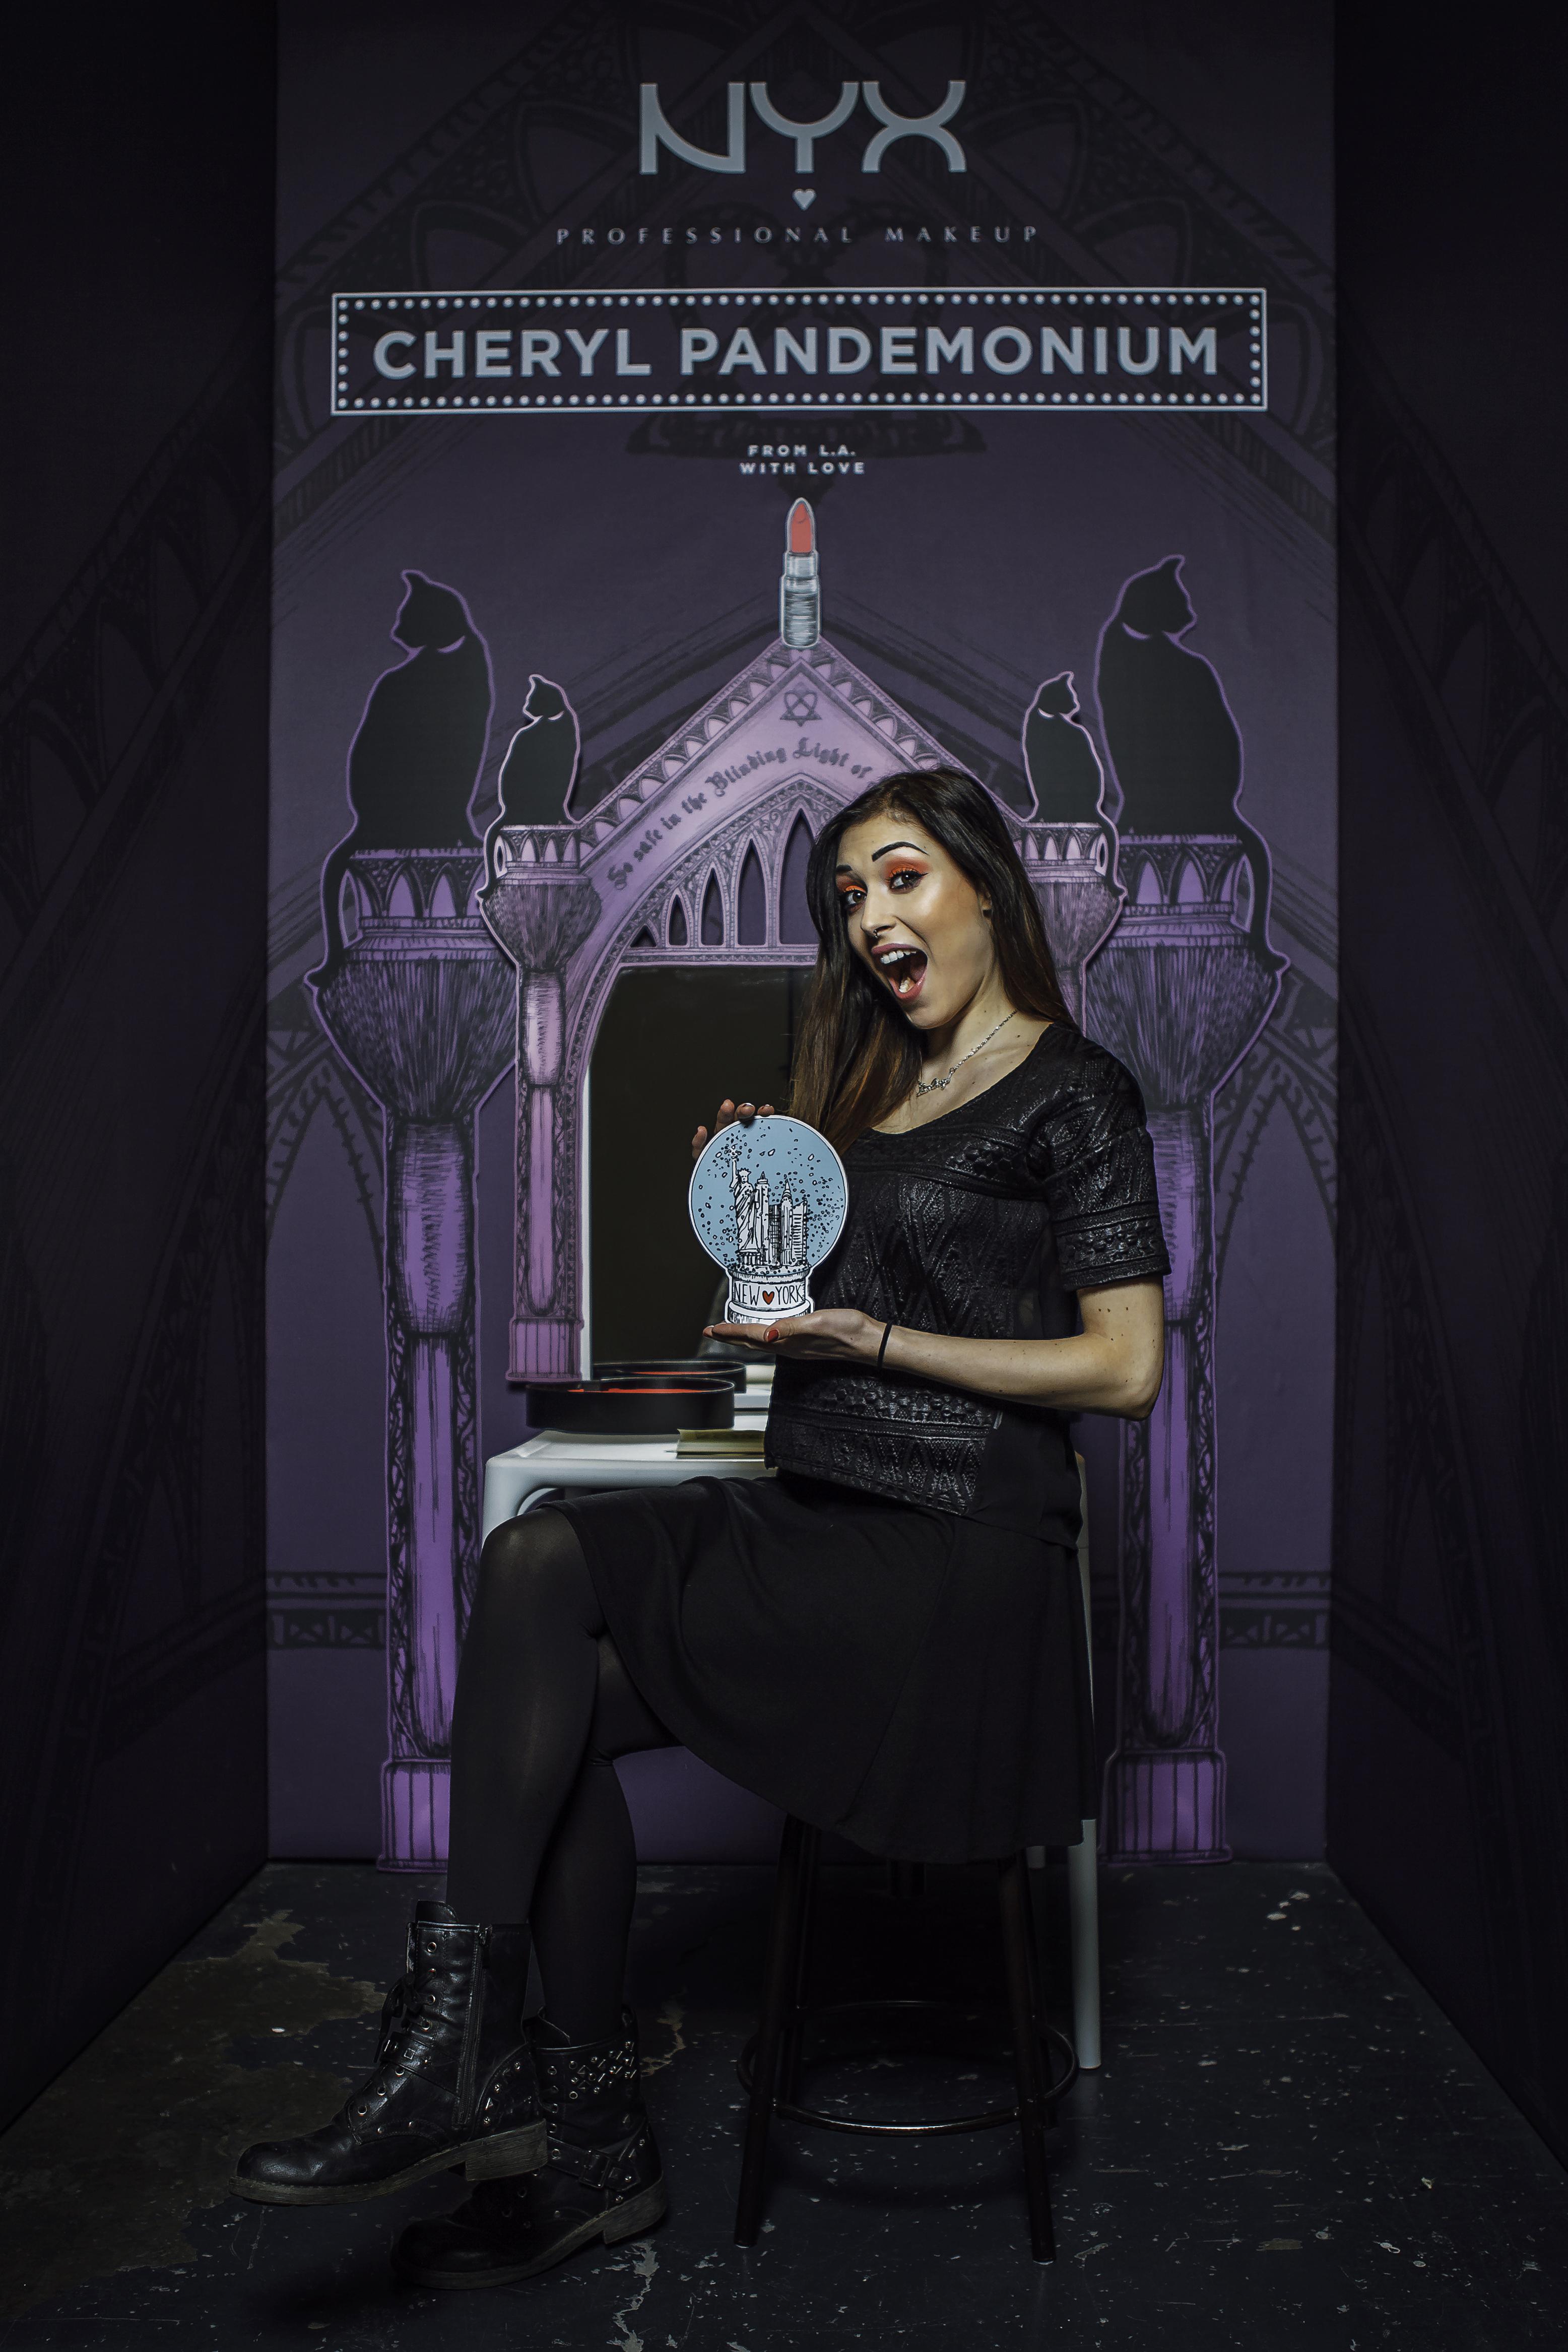 Cheryl Pandemonium by elena borghi